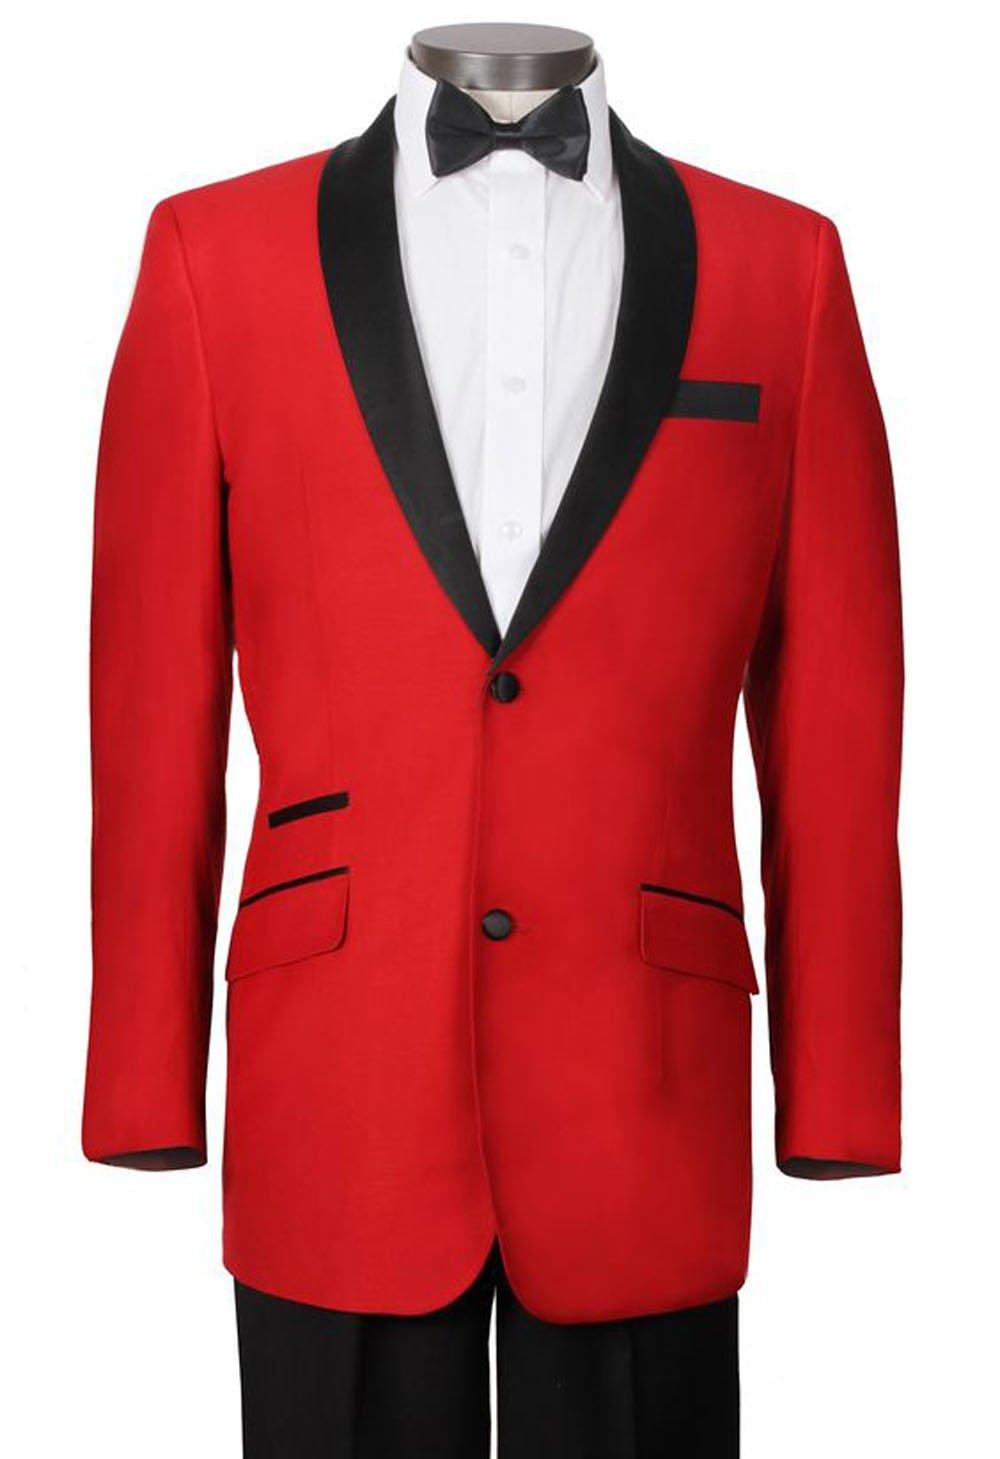 Tailorsun Custom Made Mens Red Tuxedo Shawl Lapel Jacket +Pants +Bow Tie